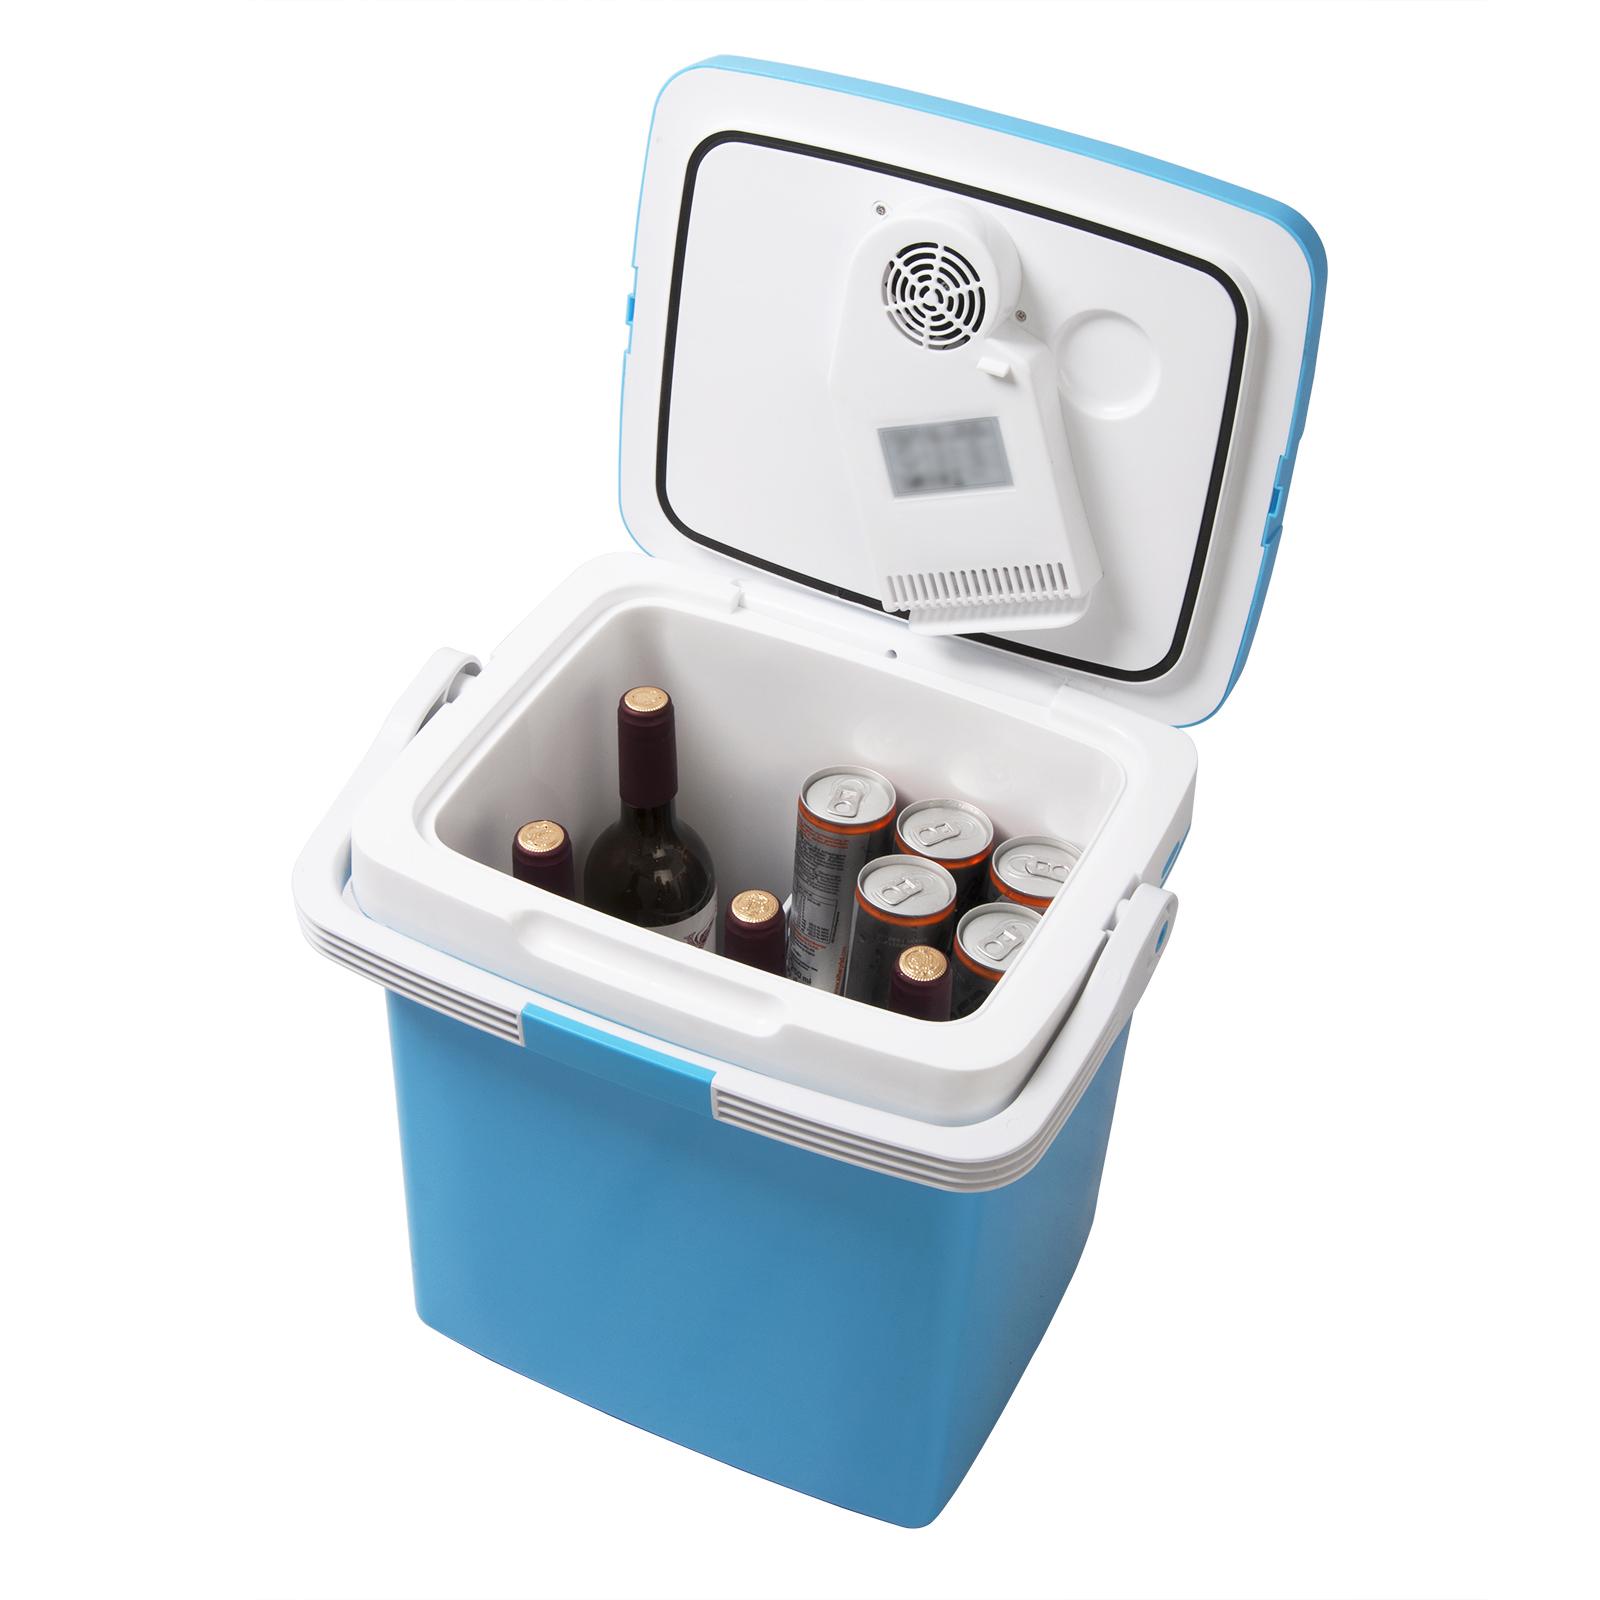 26l glaci re lectrique mini r frig rateur pour voiture et camping bleu kue001bl ebay. Black Bedroom Furniture Sets. Home Design Ideas